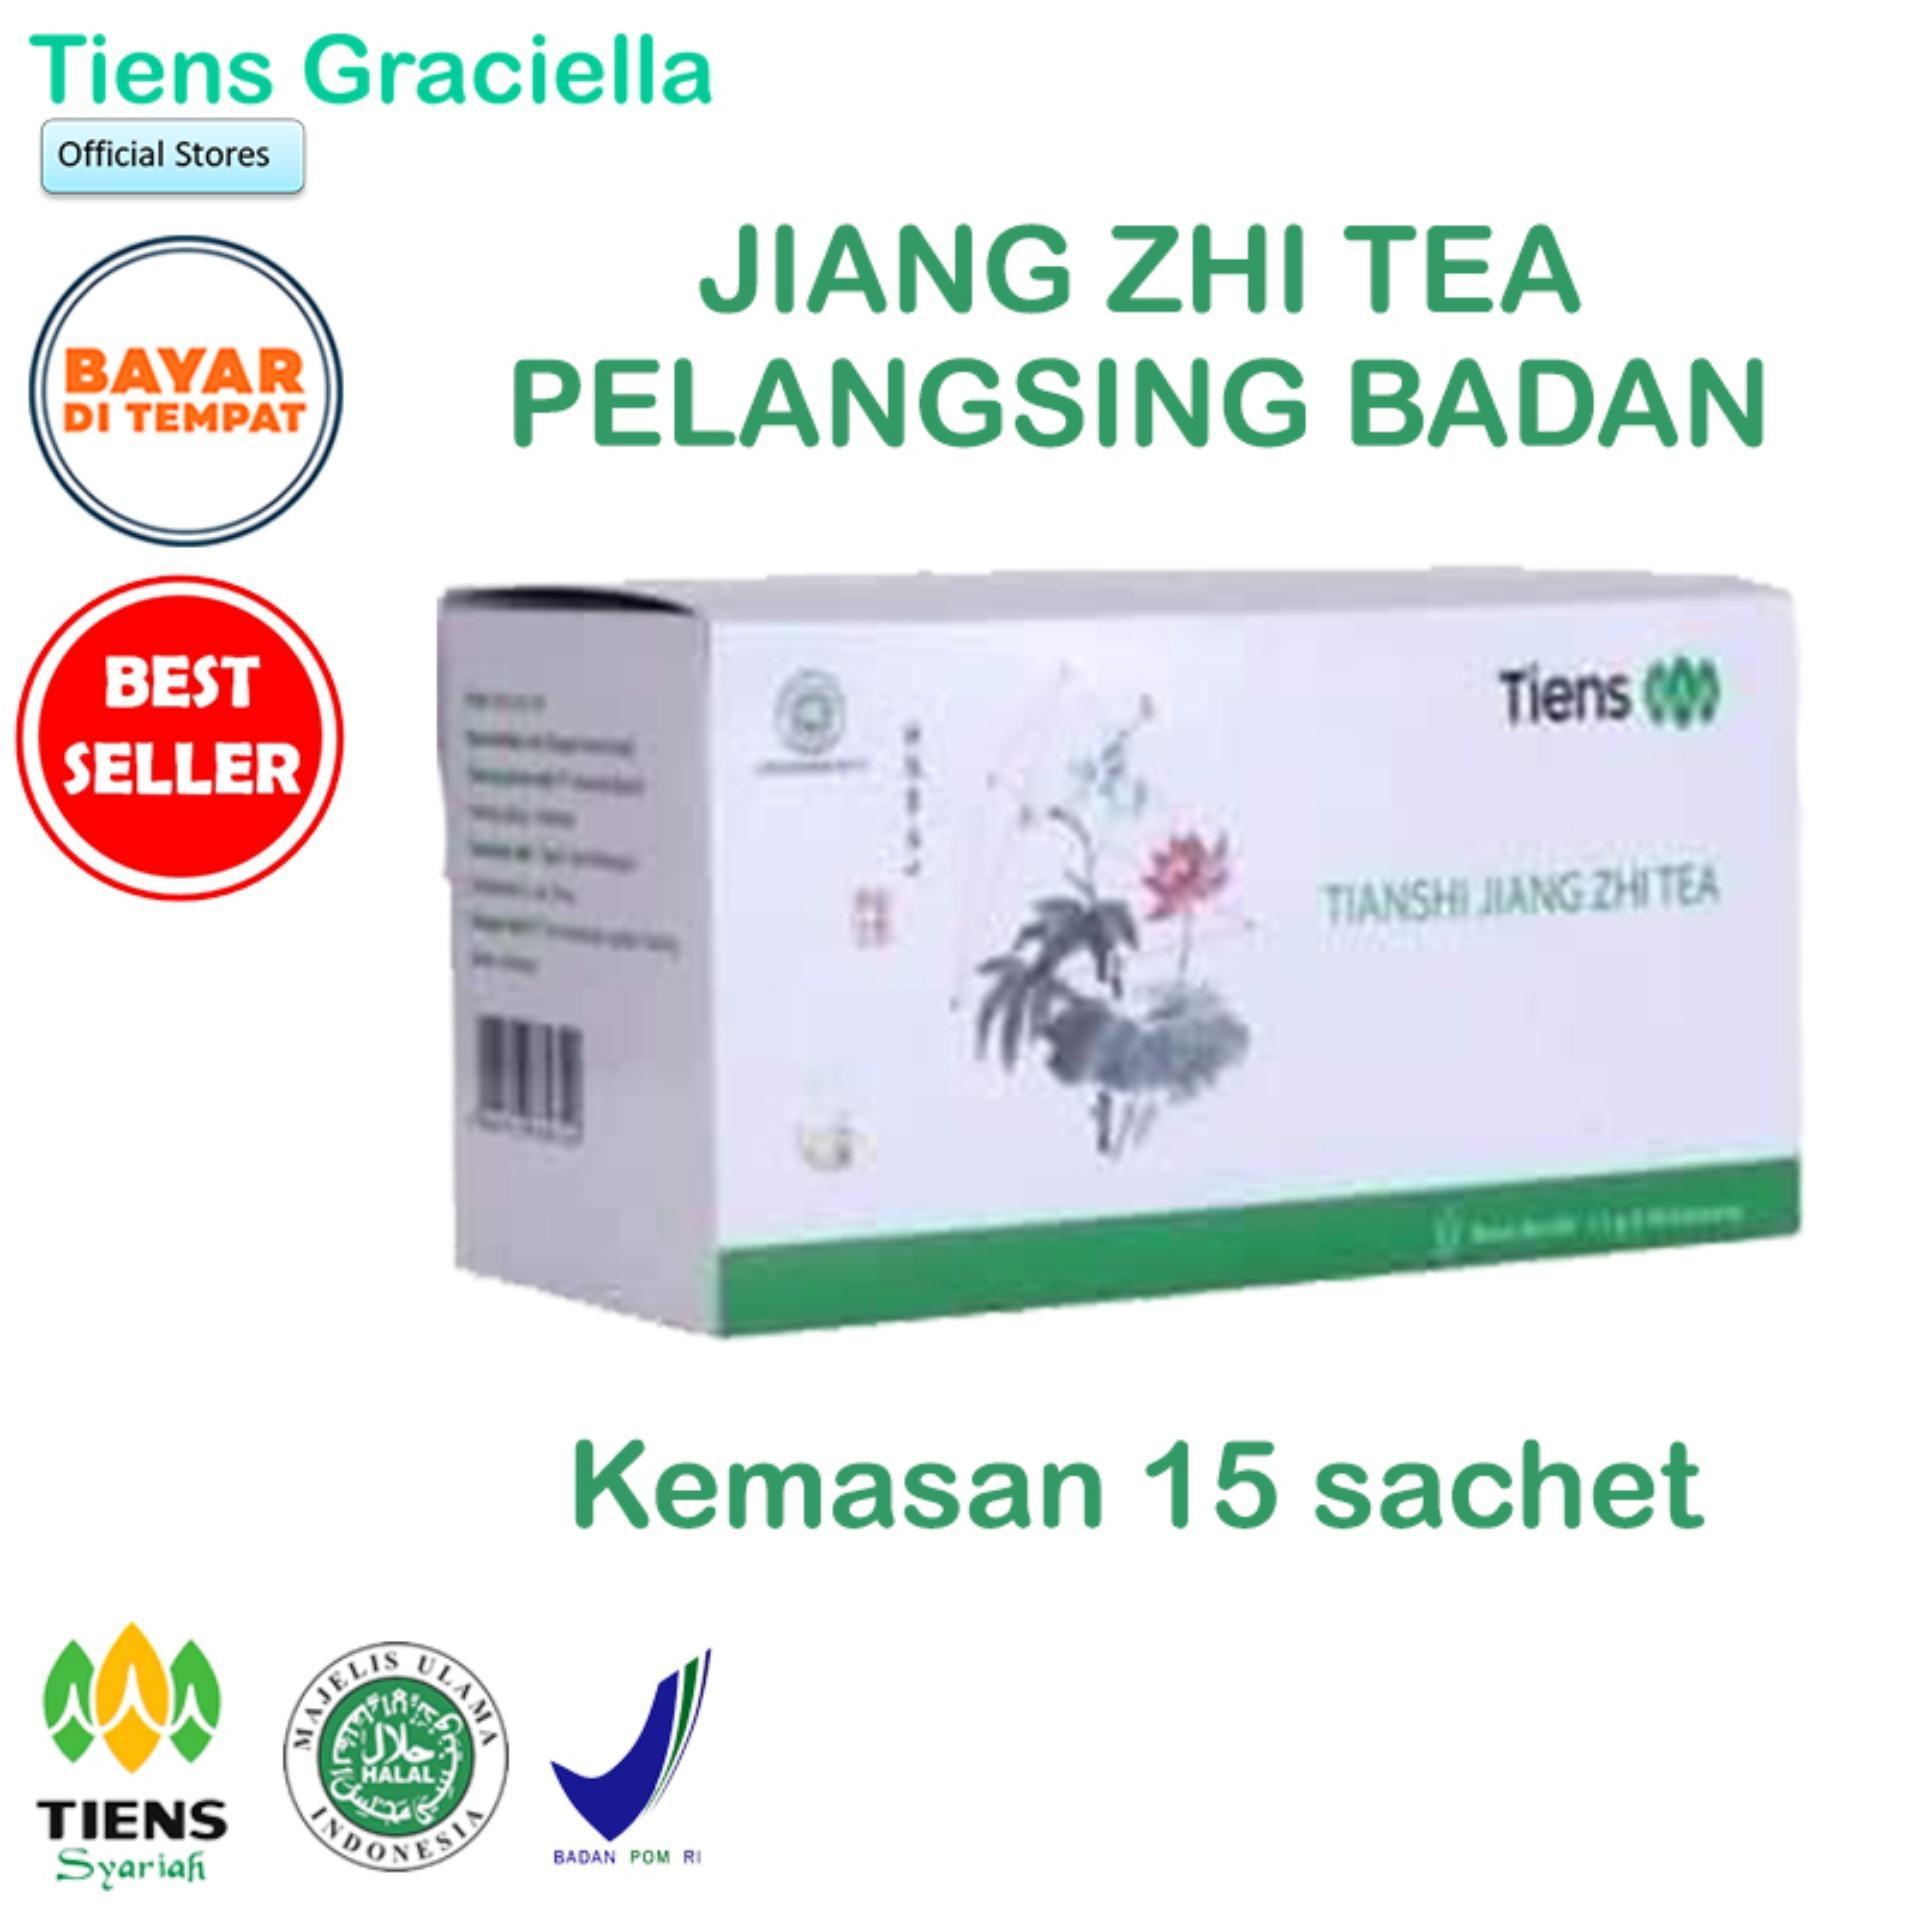 Tiens Teh Pelangsing Perut Buncit Teh Diet Jiang Zhi Tea – Paket Promo  Banting Harga   5694ebadd5